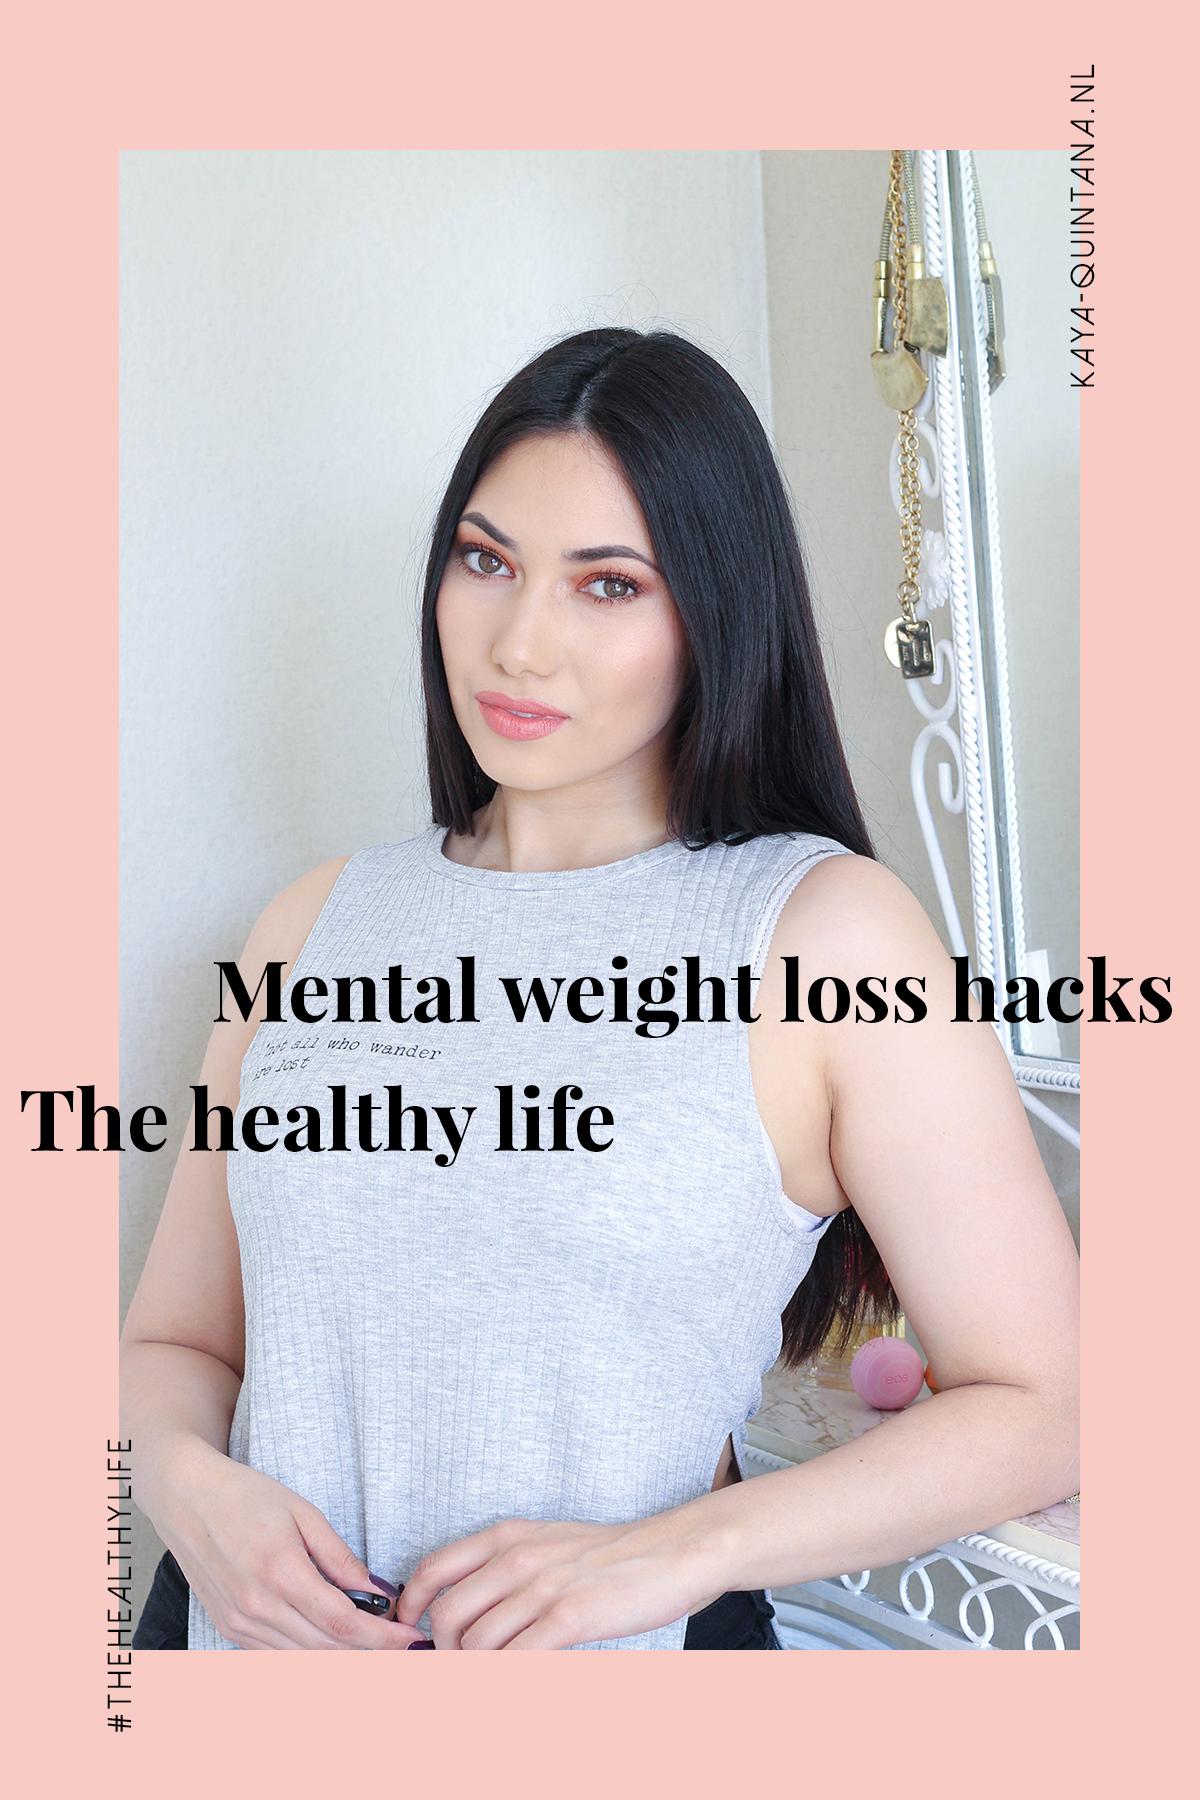 mental weight loss hacks